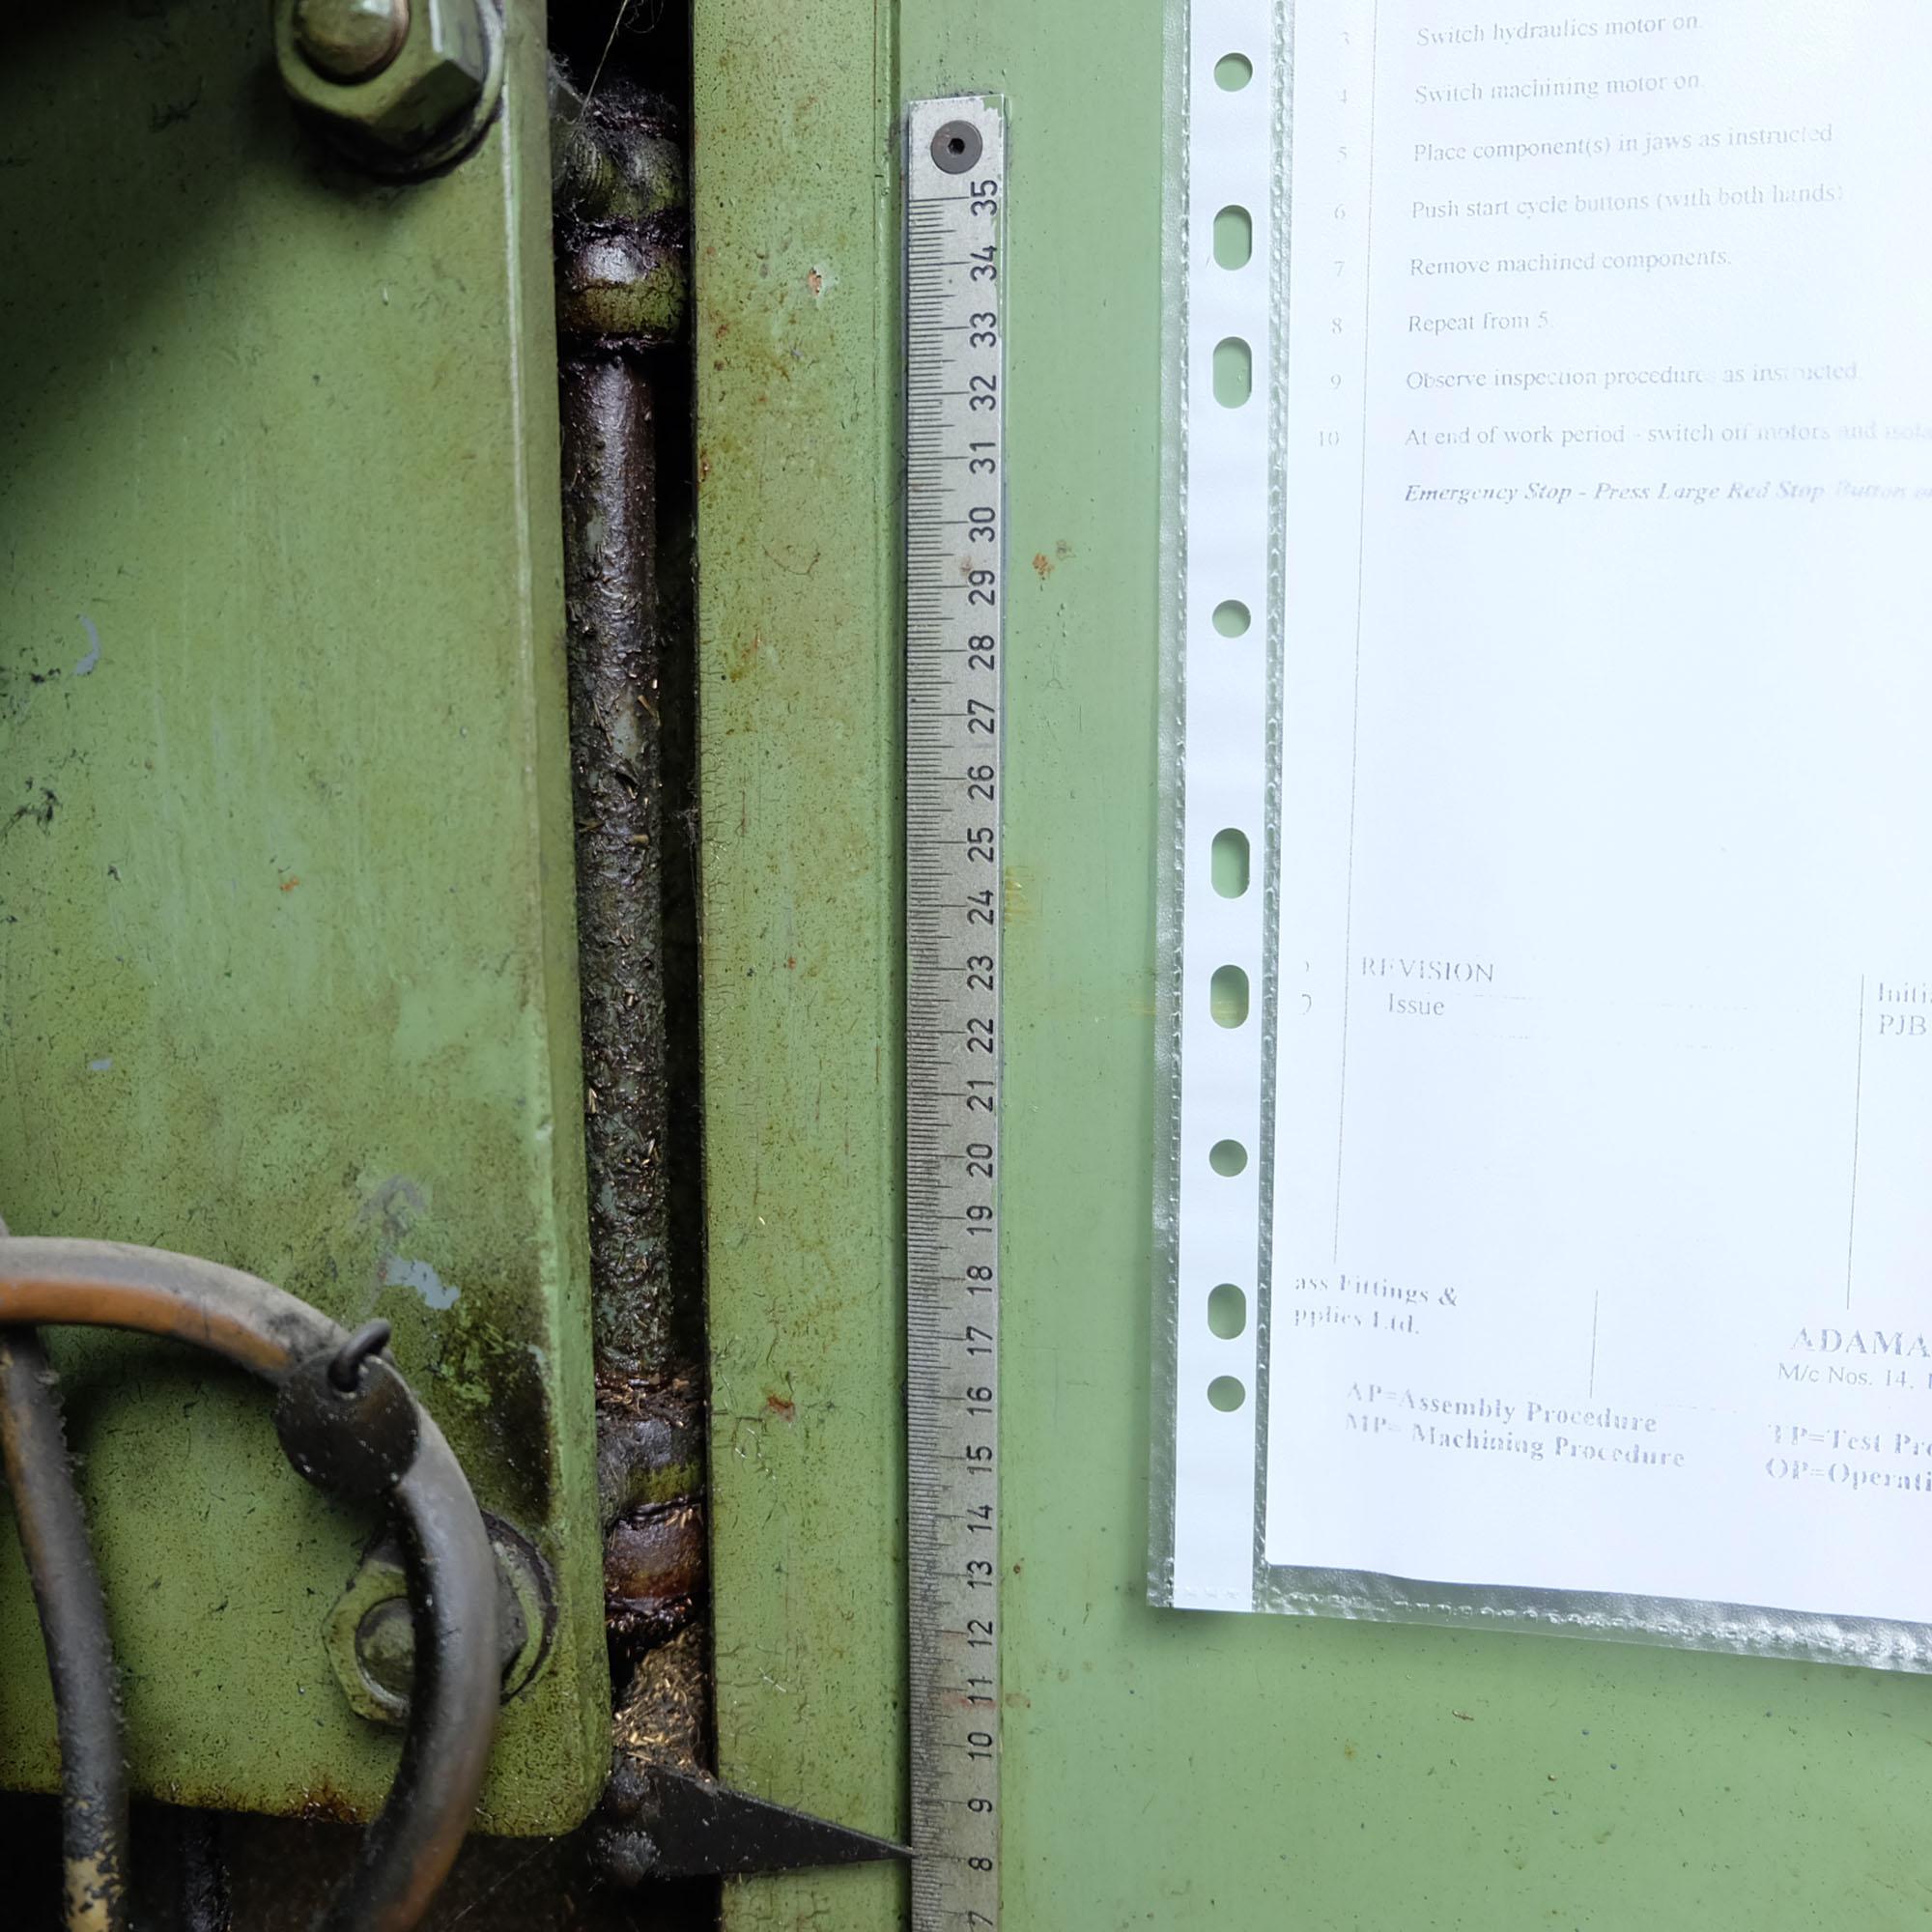 Witzig & Frank Model Adamat 4 BG/22. Six Station Indexing Rotary Transfer Machine. - Image 8 of 11